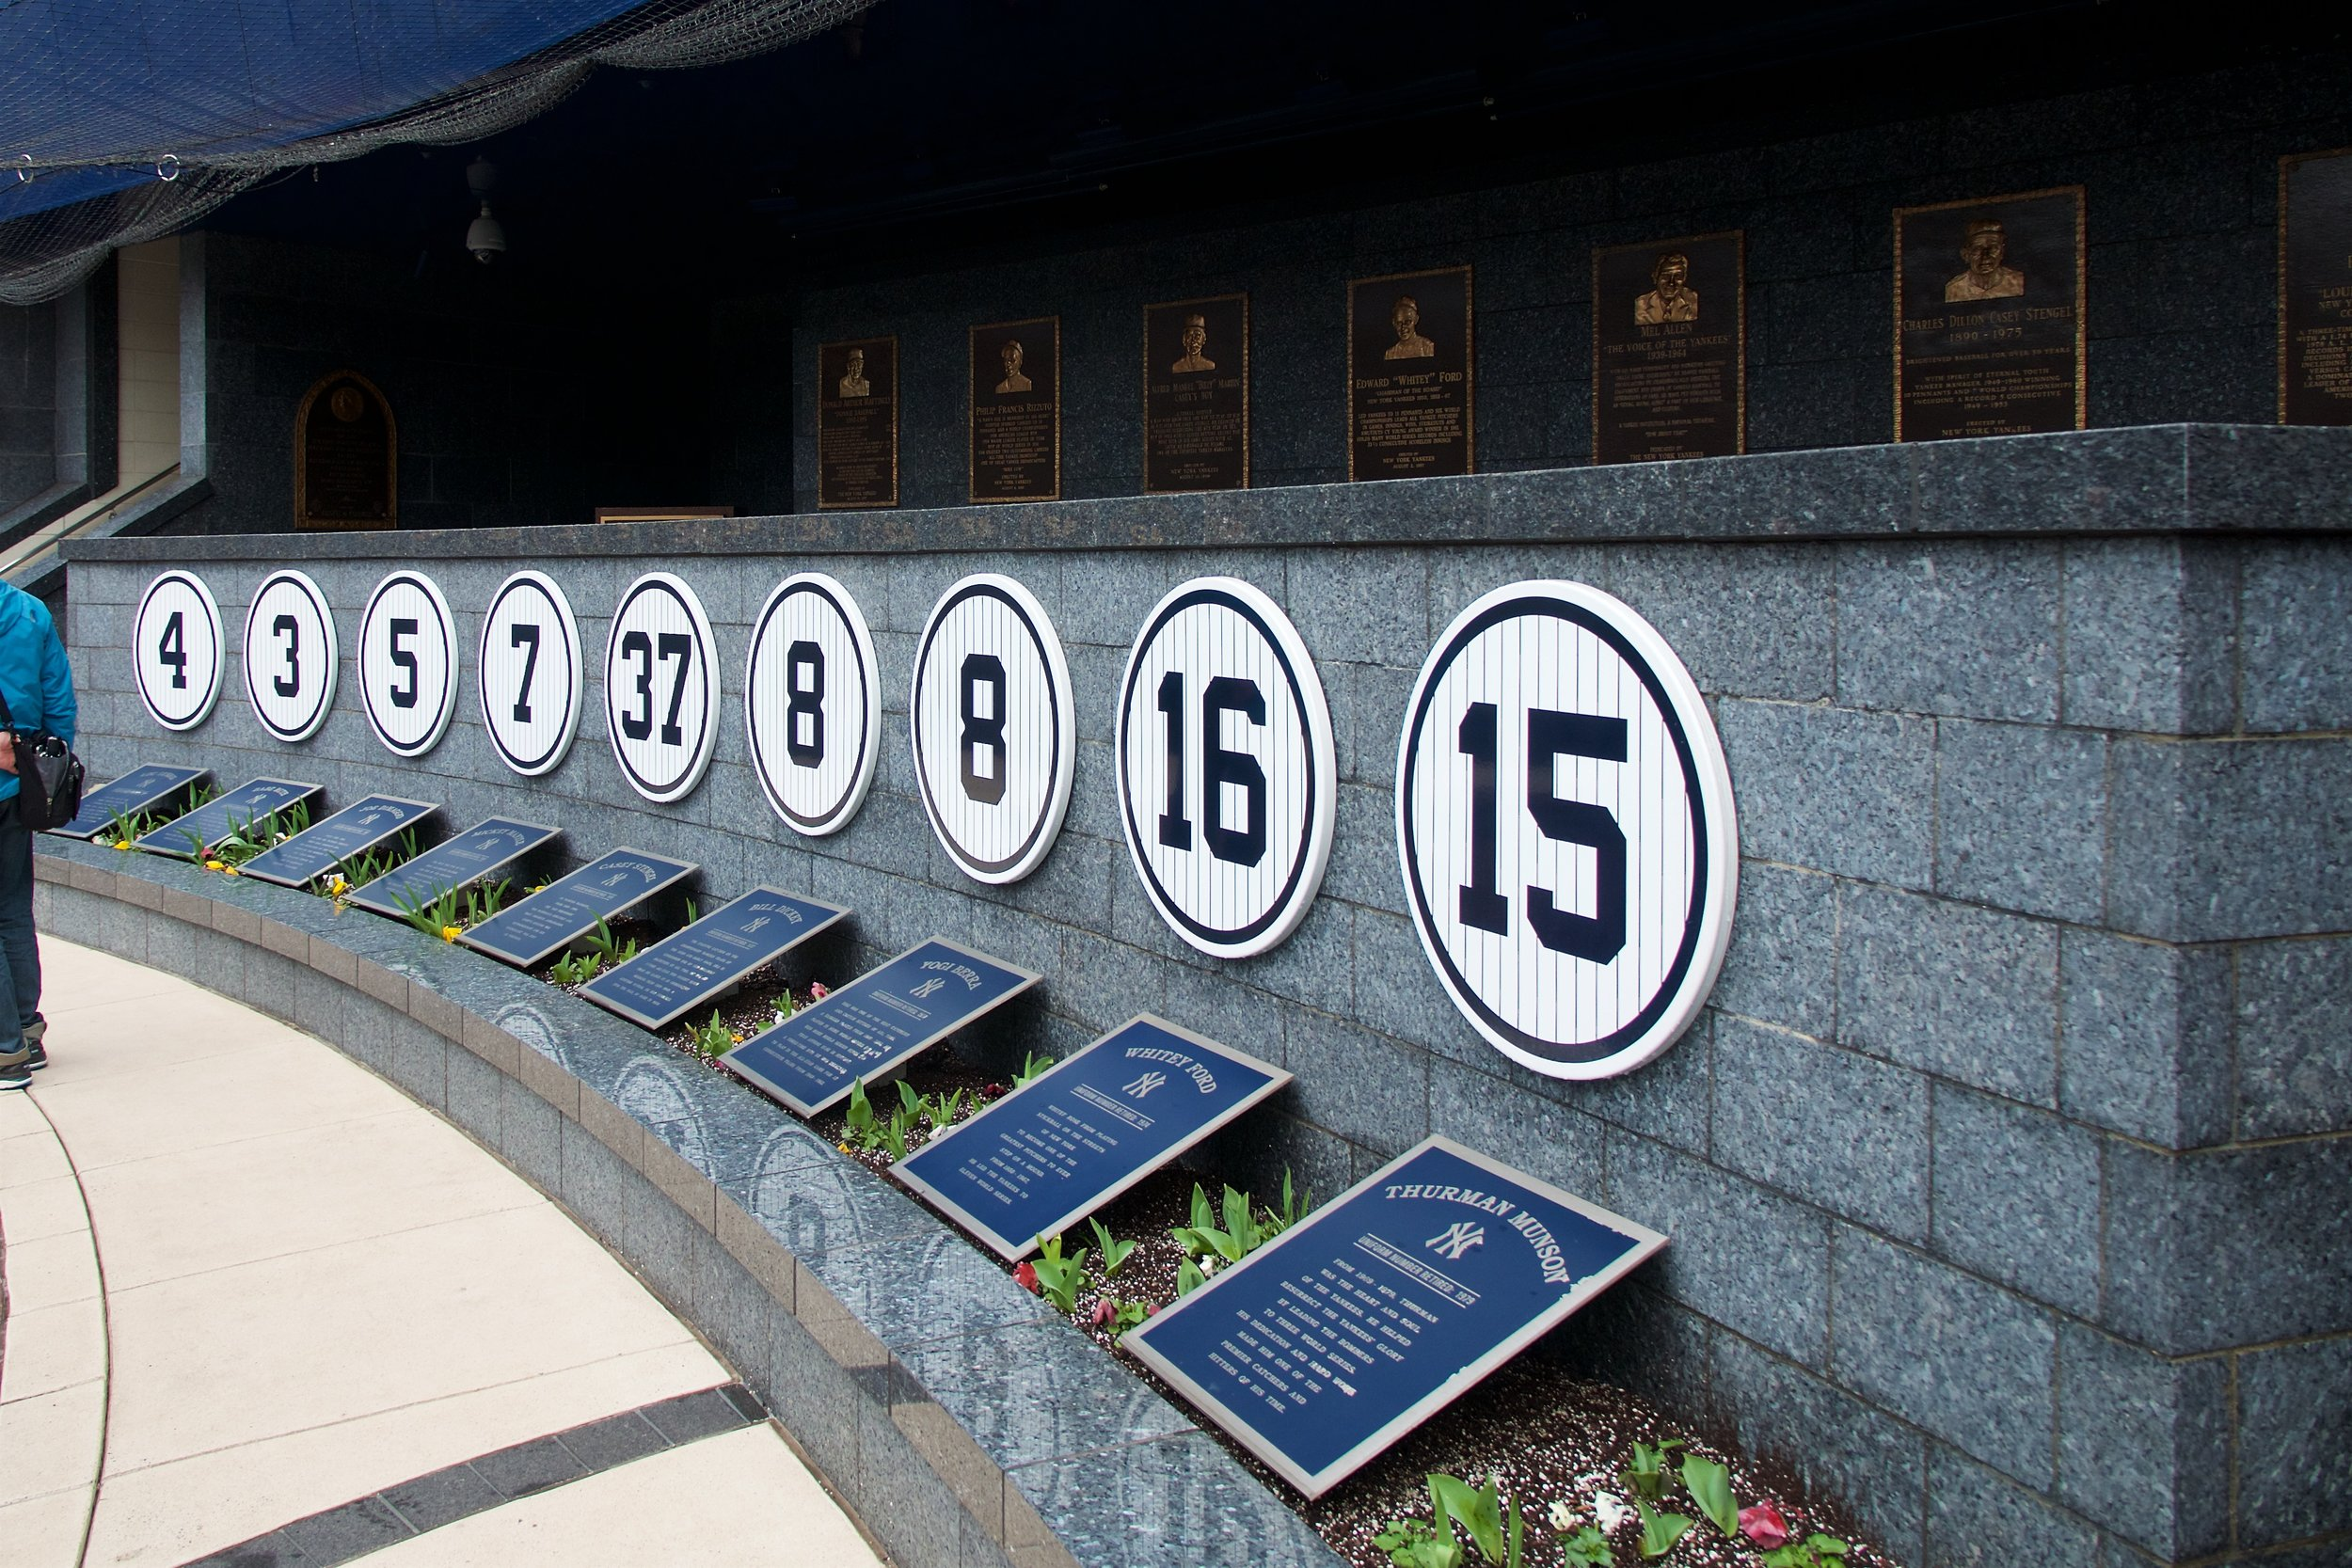 Monument Park (Lou Gehrig, Babe Ruth, Joe DiMaggio, Mickey Mantle, Casey Stengel, Bill Dickey, Yogi Berra, Whitey Ford, Thurmon Munson)